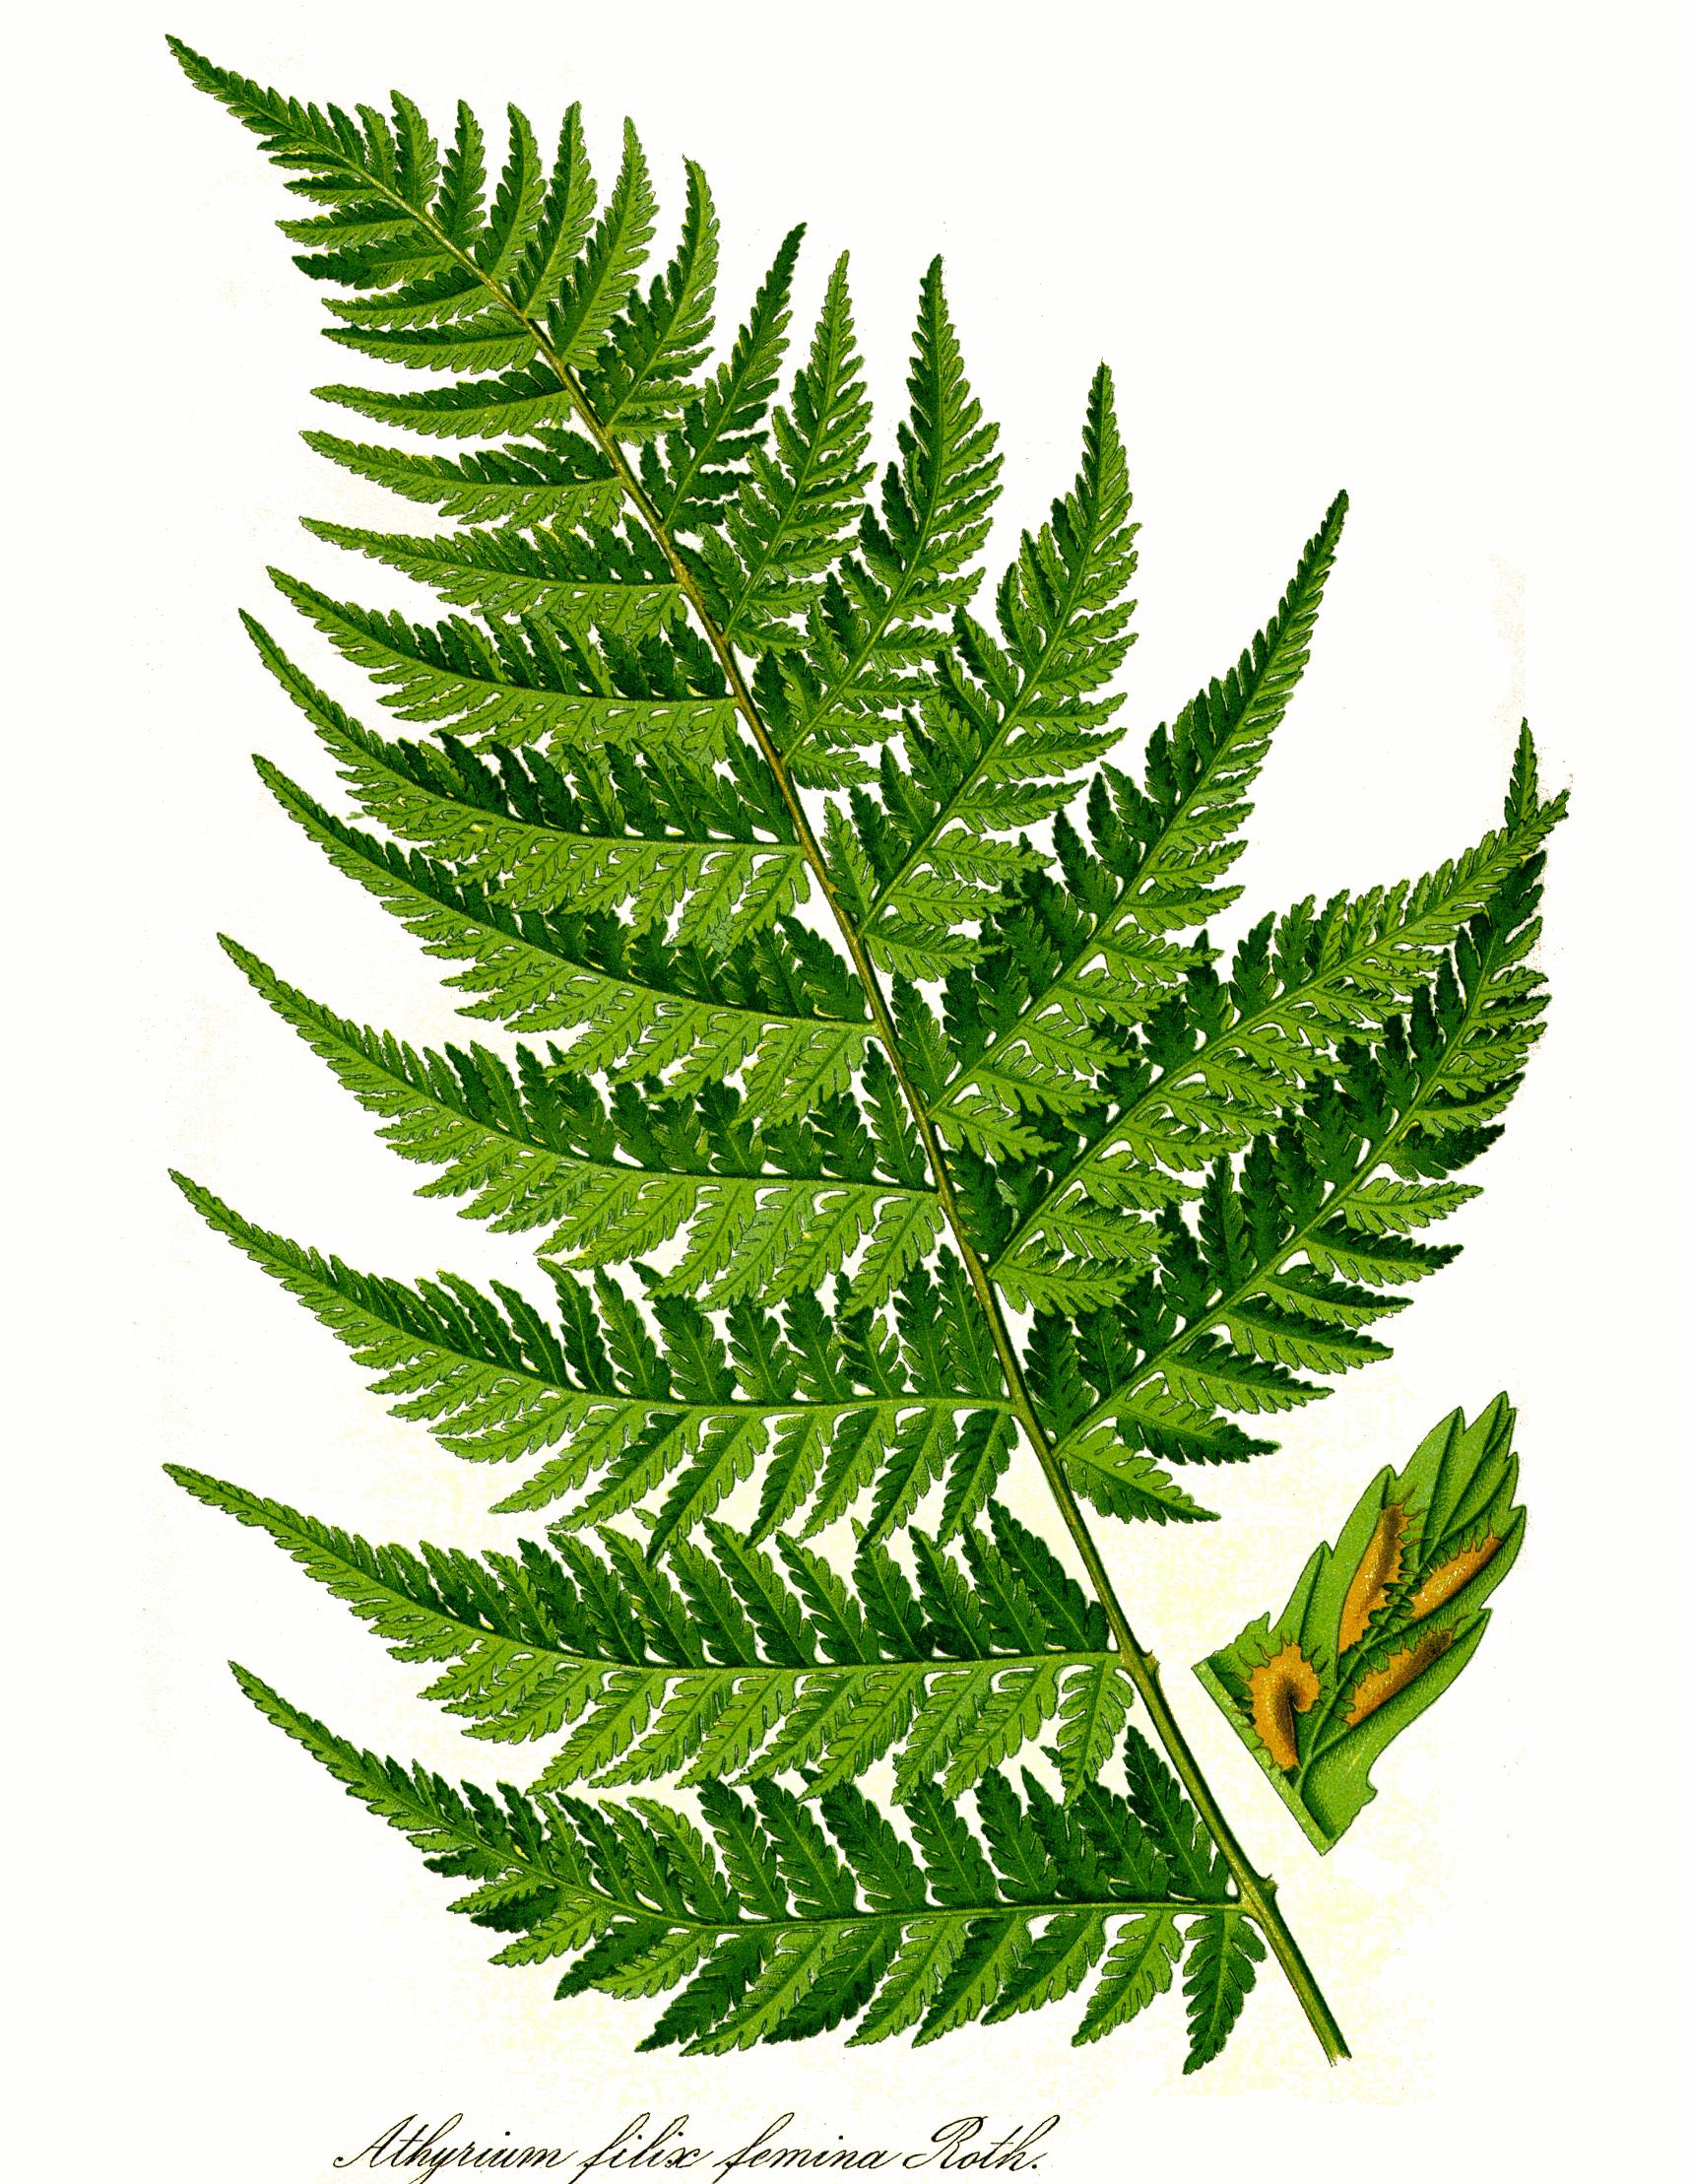 File:Athyrium filix-femina leaf png - Wikimedia Commons